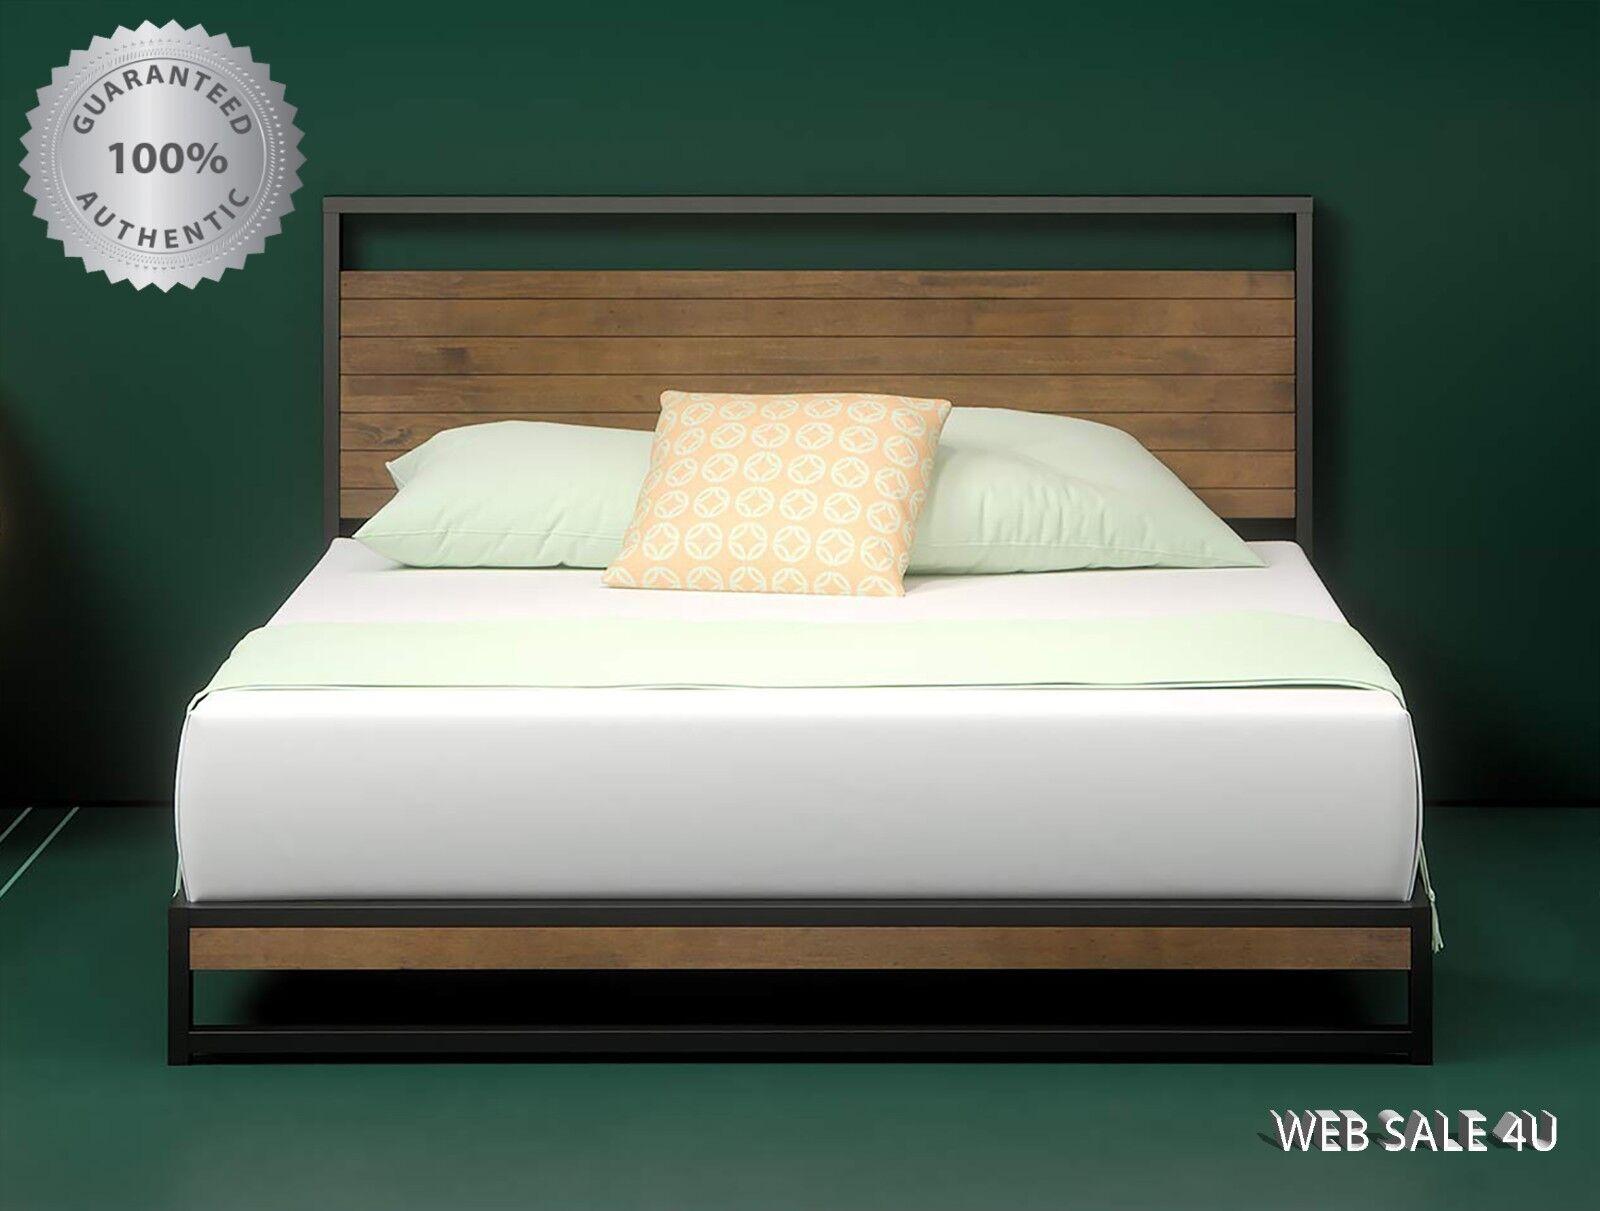 Bed Frame KING Wood Pine Headboard Metal Platform Studio Mod